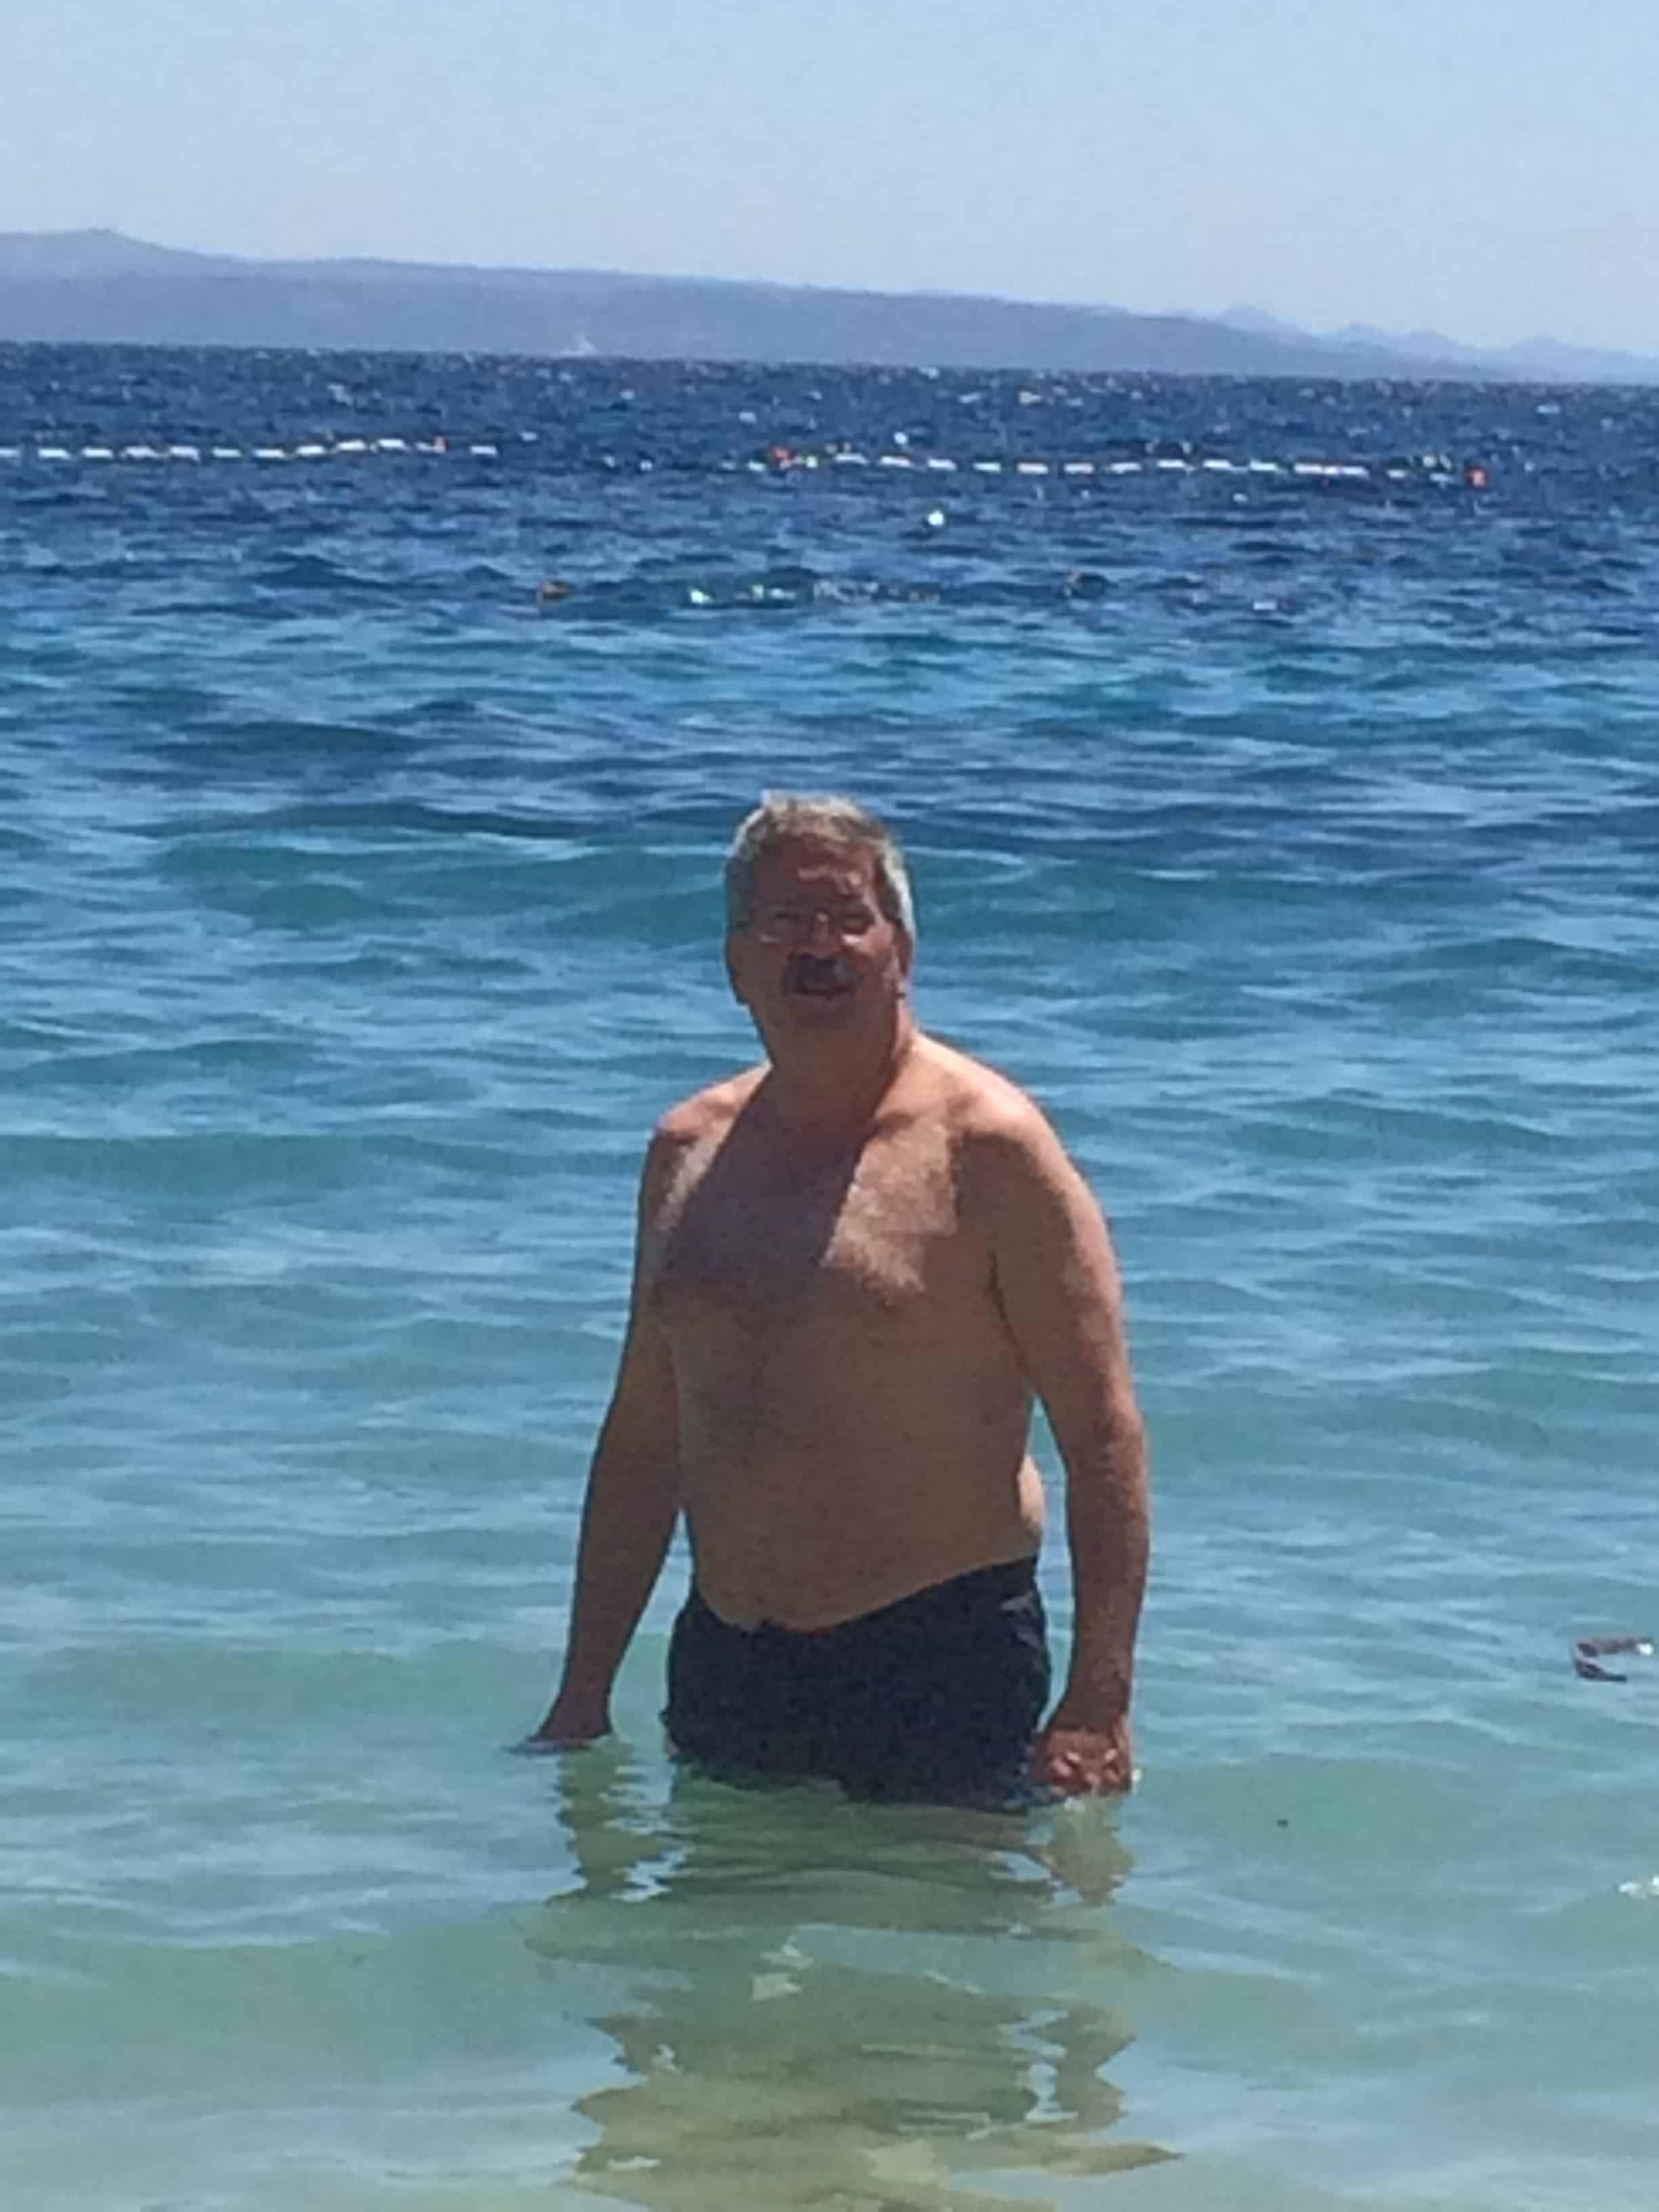 The must-do swim in the Adriatic